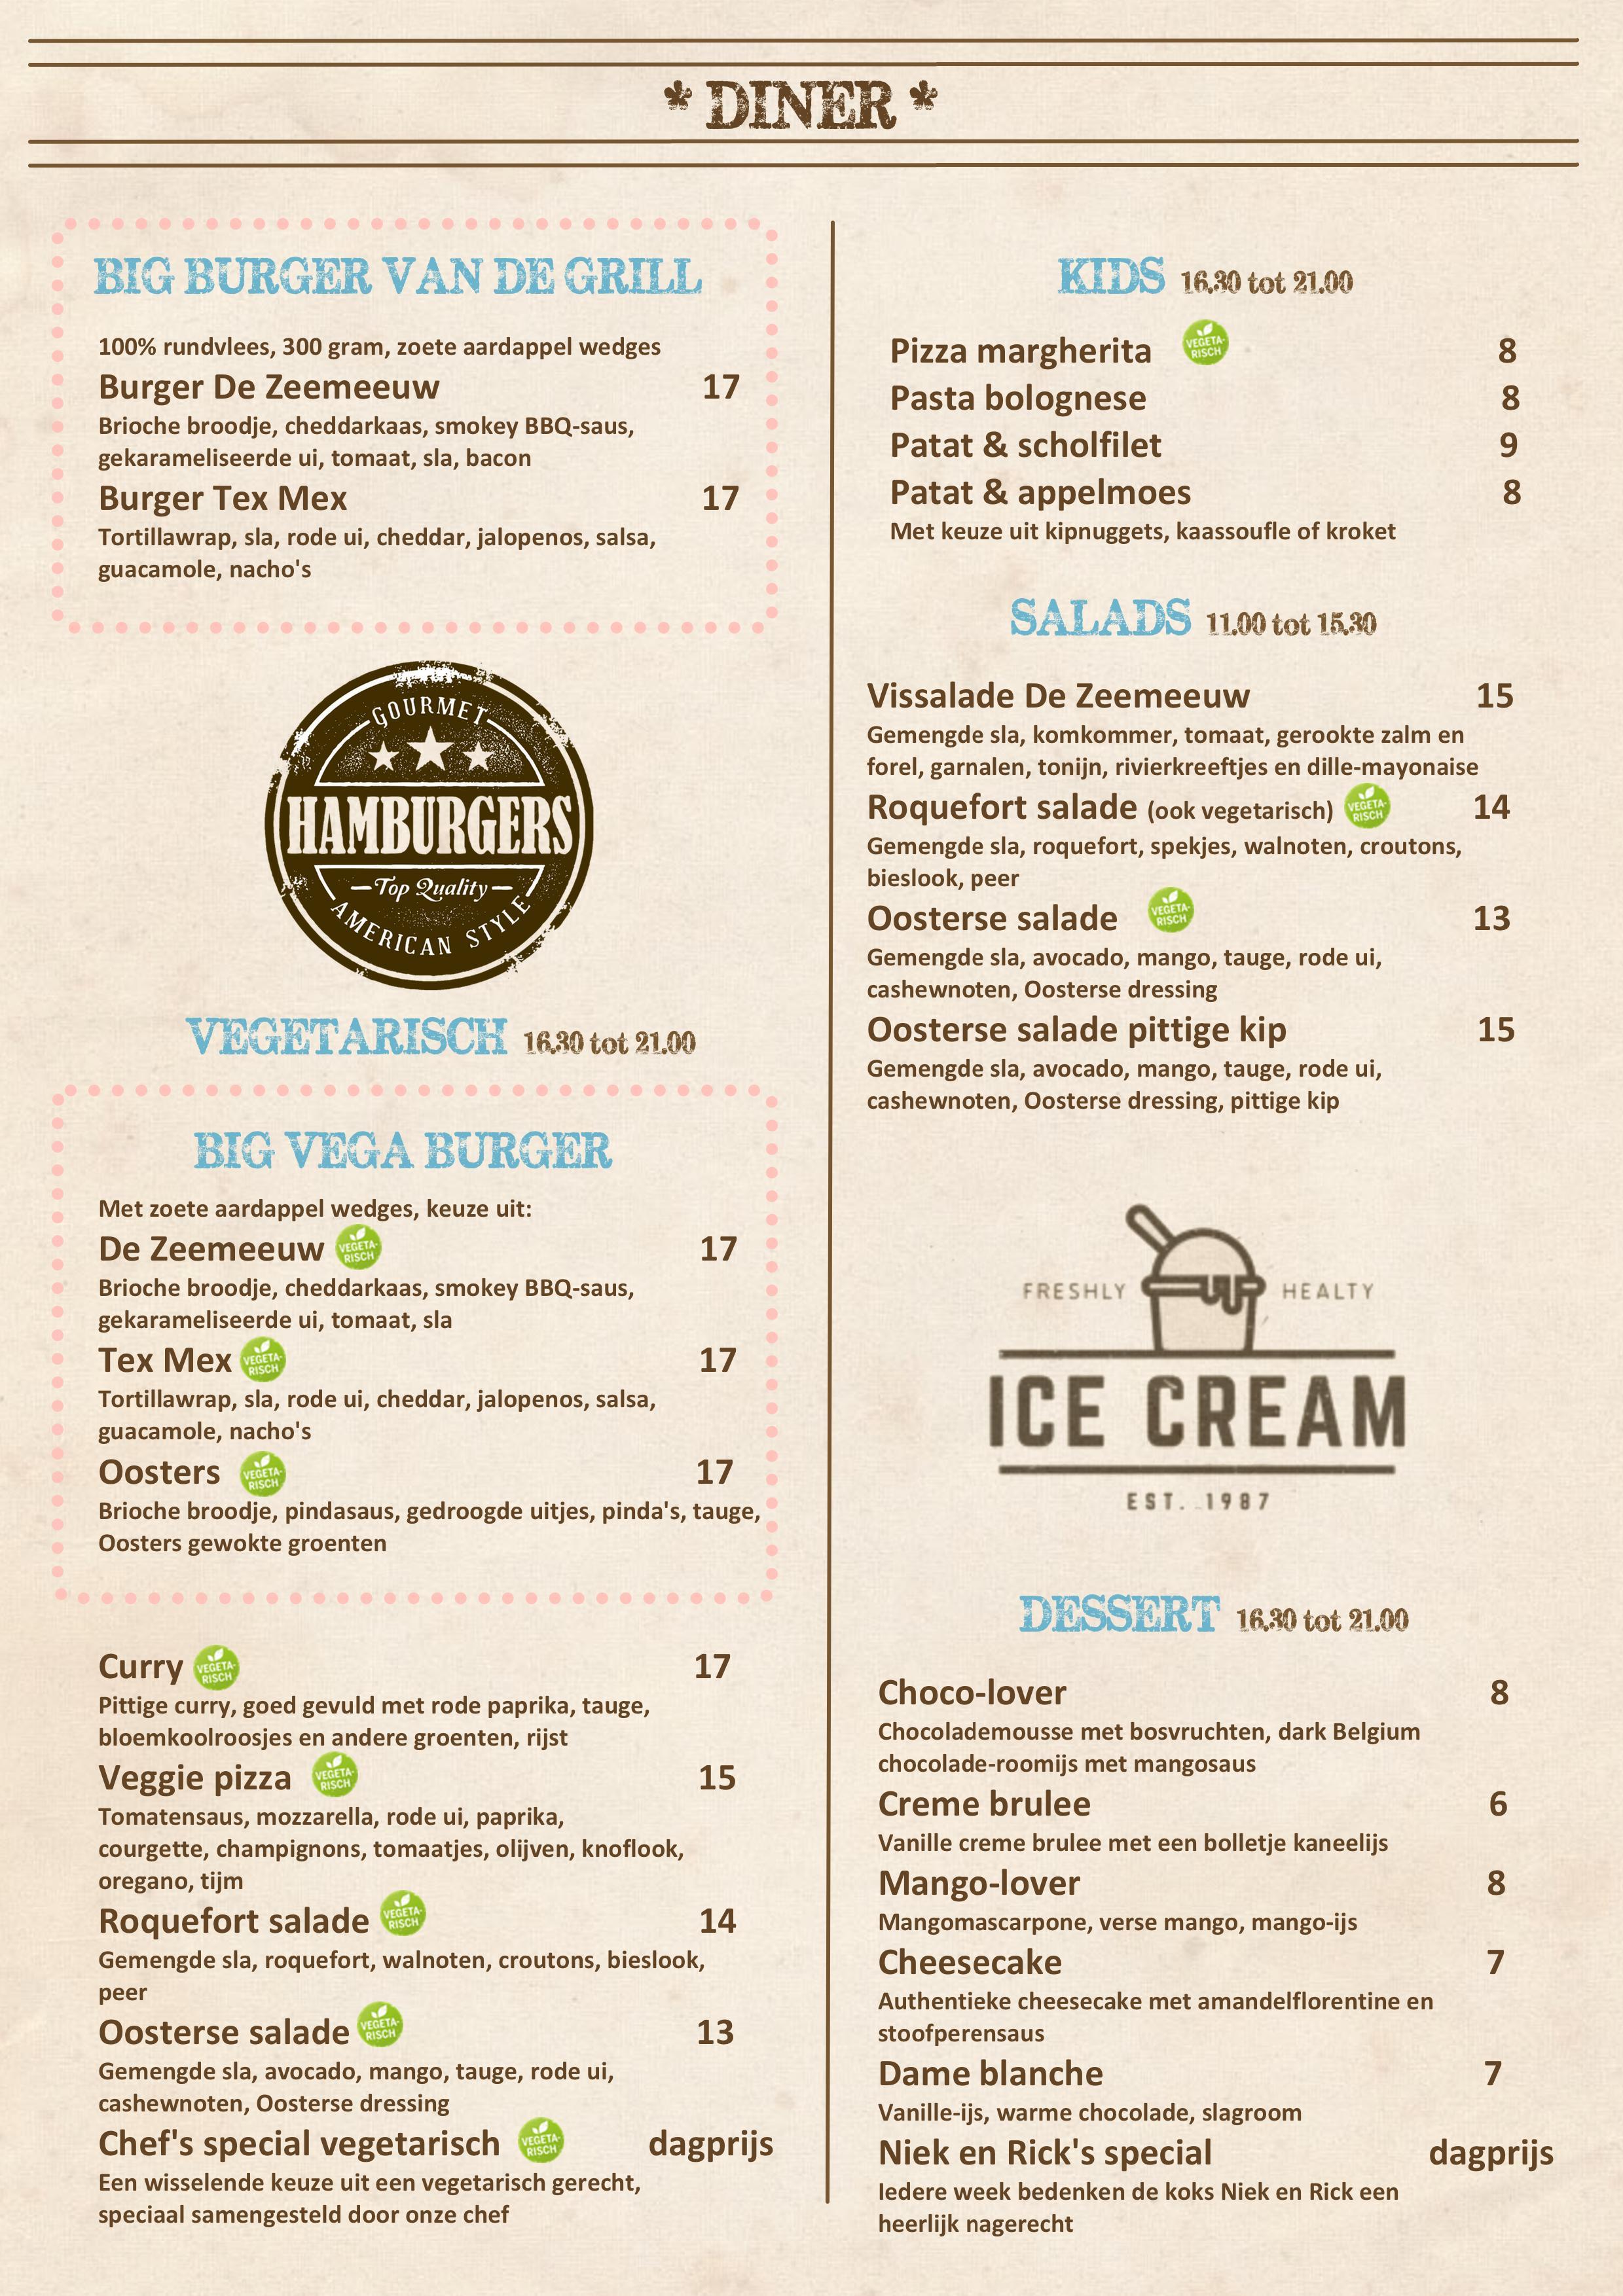 NL diner2 achterkant-page-001